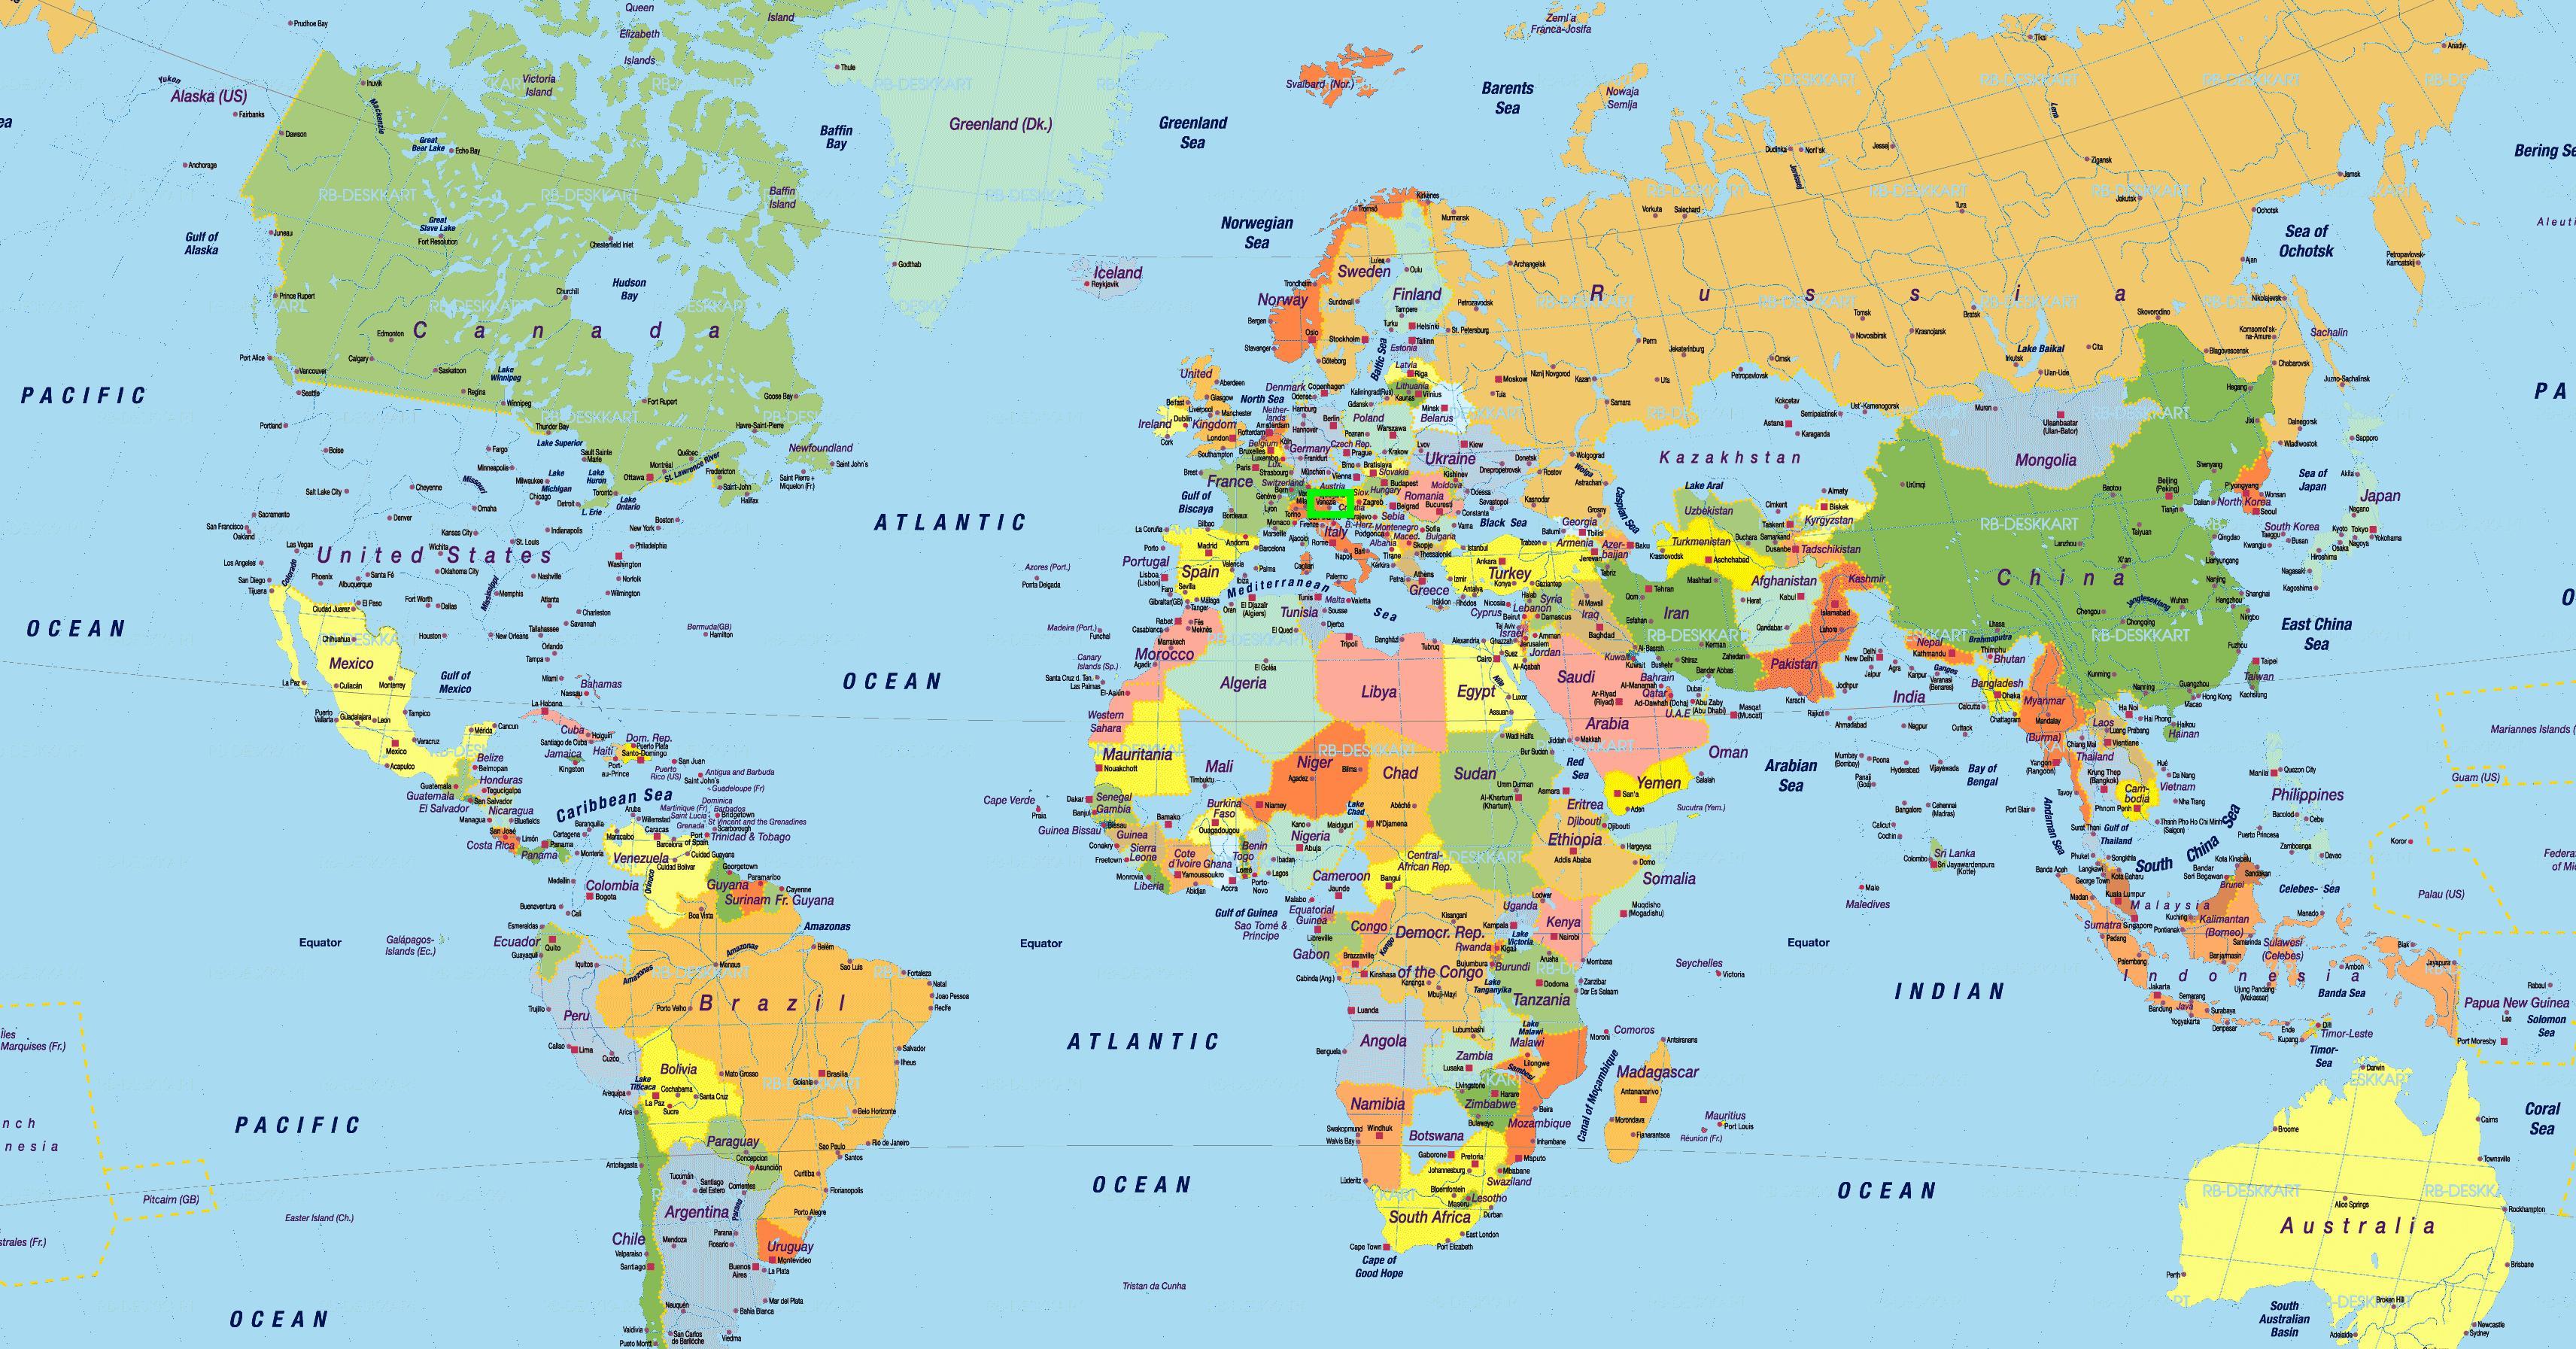 Venise carte de localisation - Venise italie carte du ...